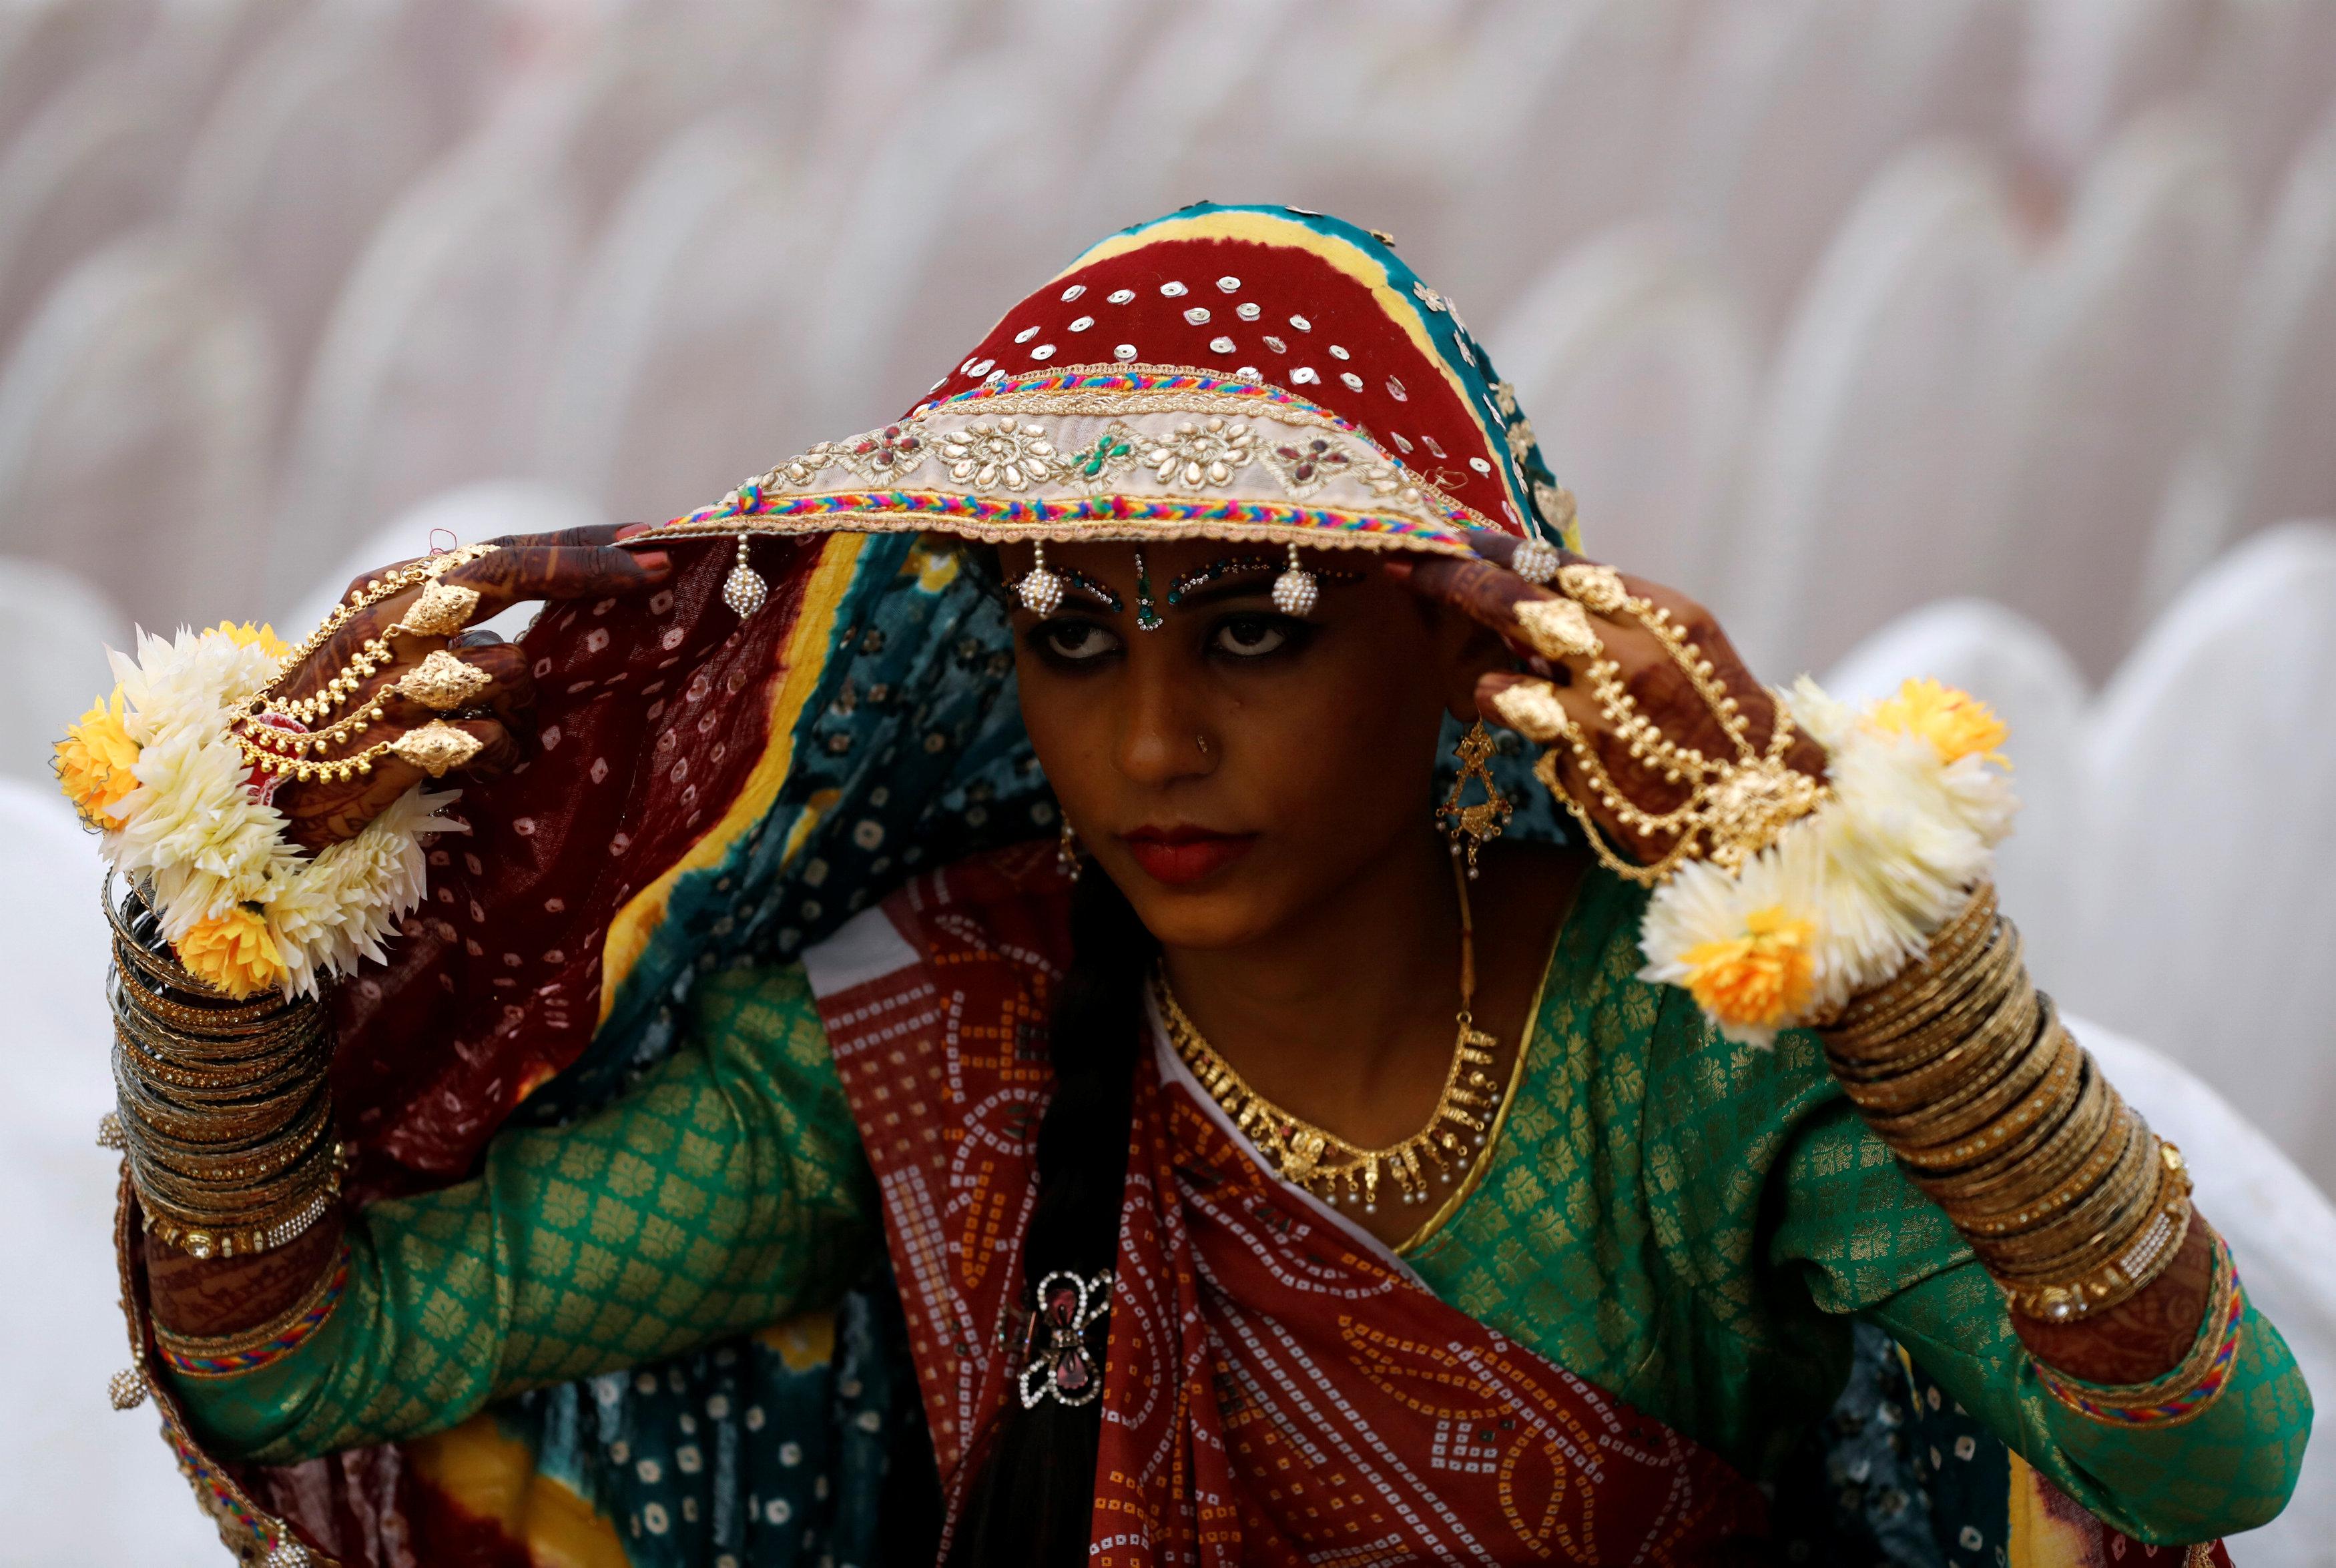 حفل زفاف جماعى للهندوس فى كراتشى (1)